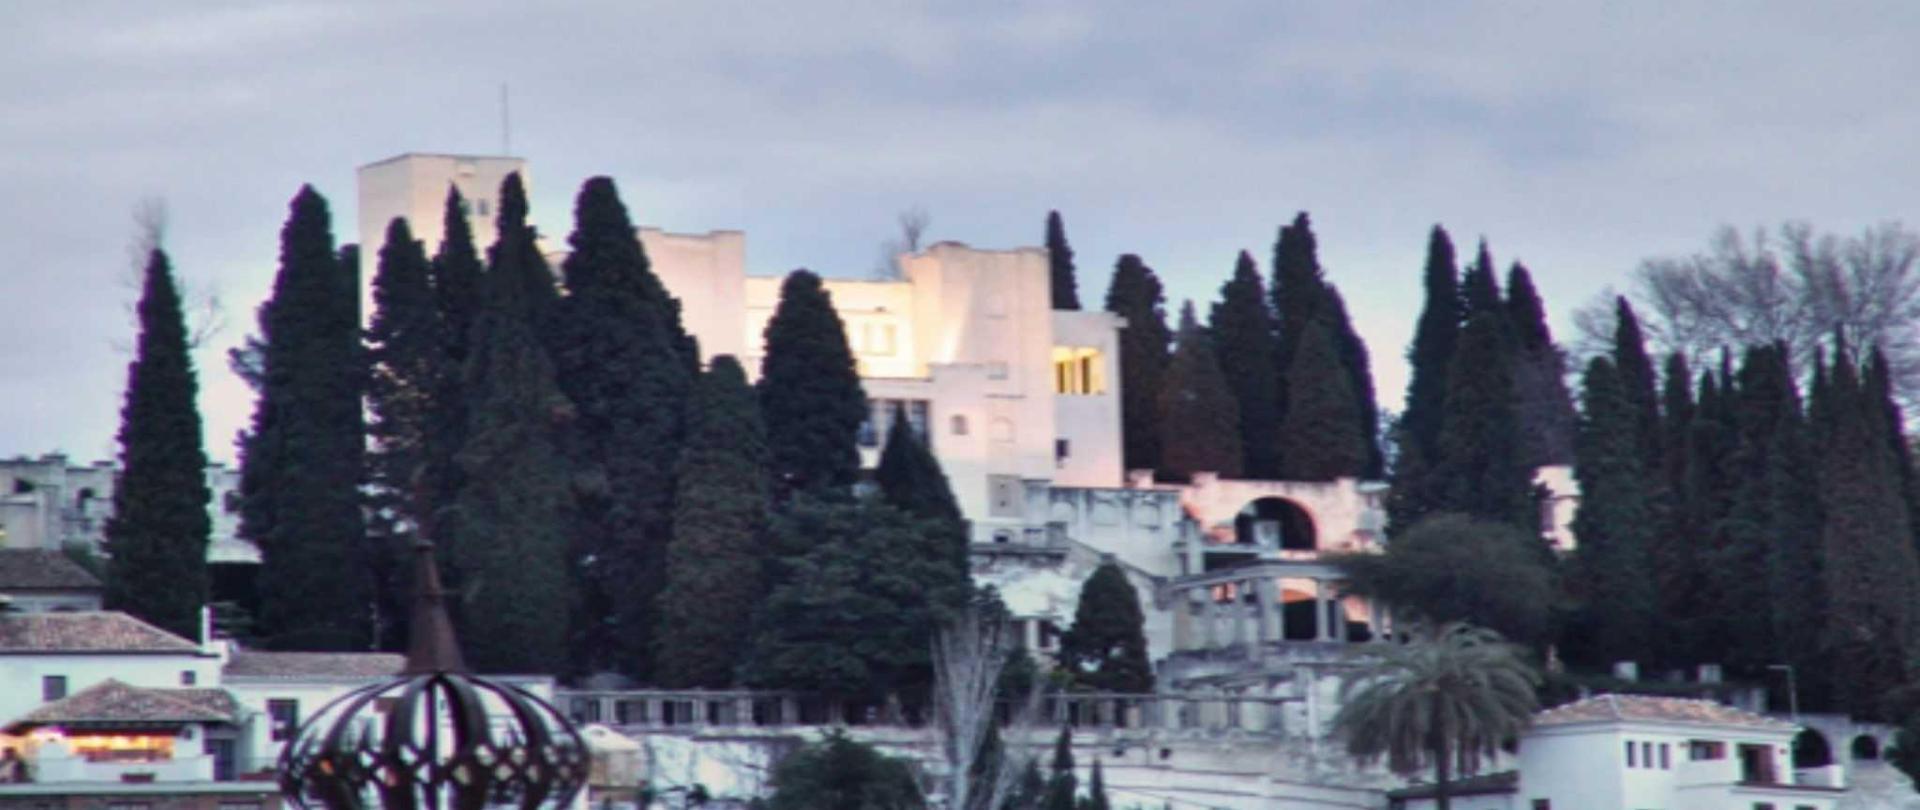 hotel-carlos-v-vistas-alhambra-1.jpg